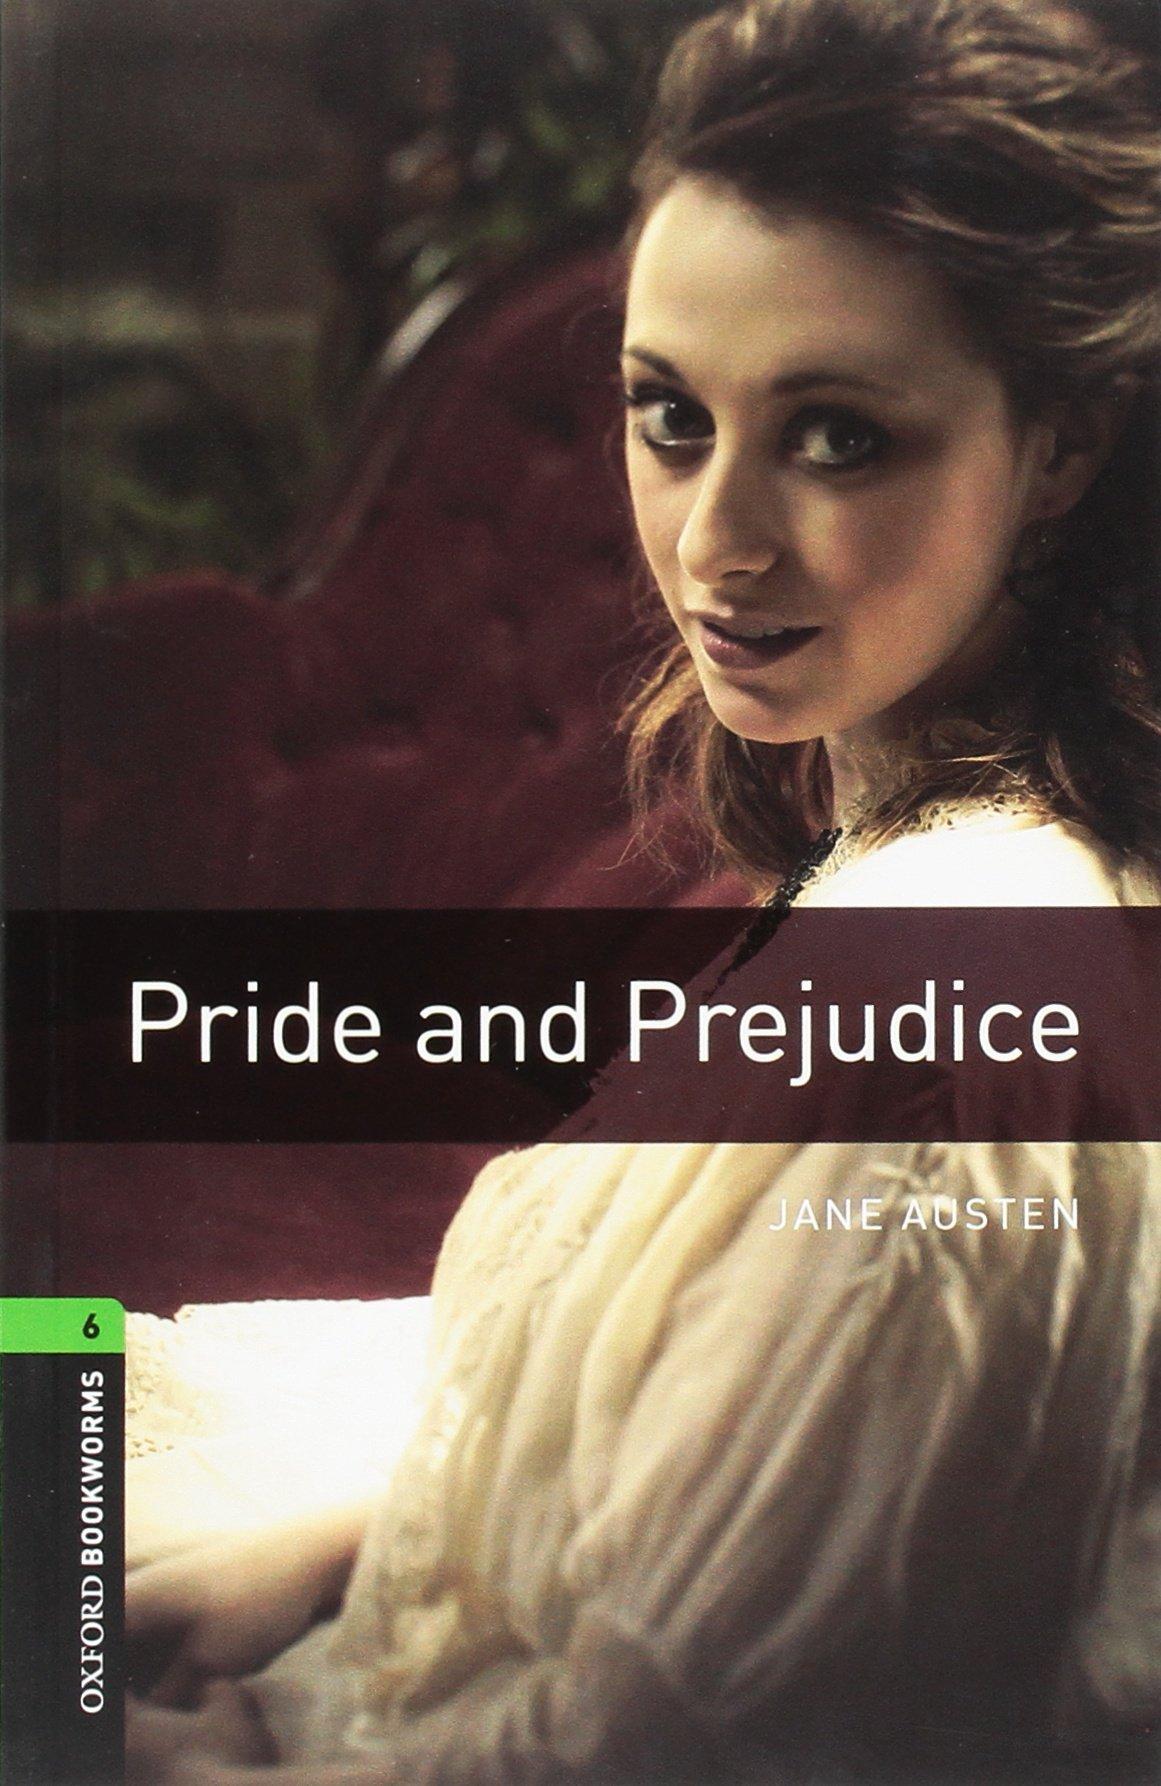 Oxford Bookworms Library: 10. Schuljahr, Stufe 3 - Pride and Prejudice: Reader (Oxford Bookworms Library. Classics, Stage 6)